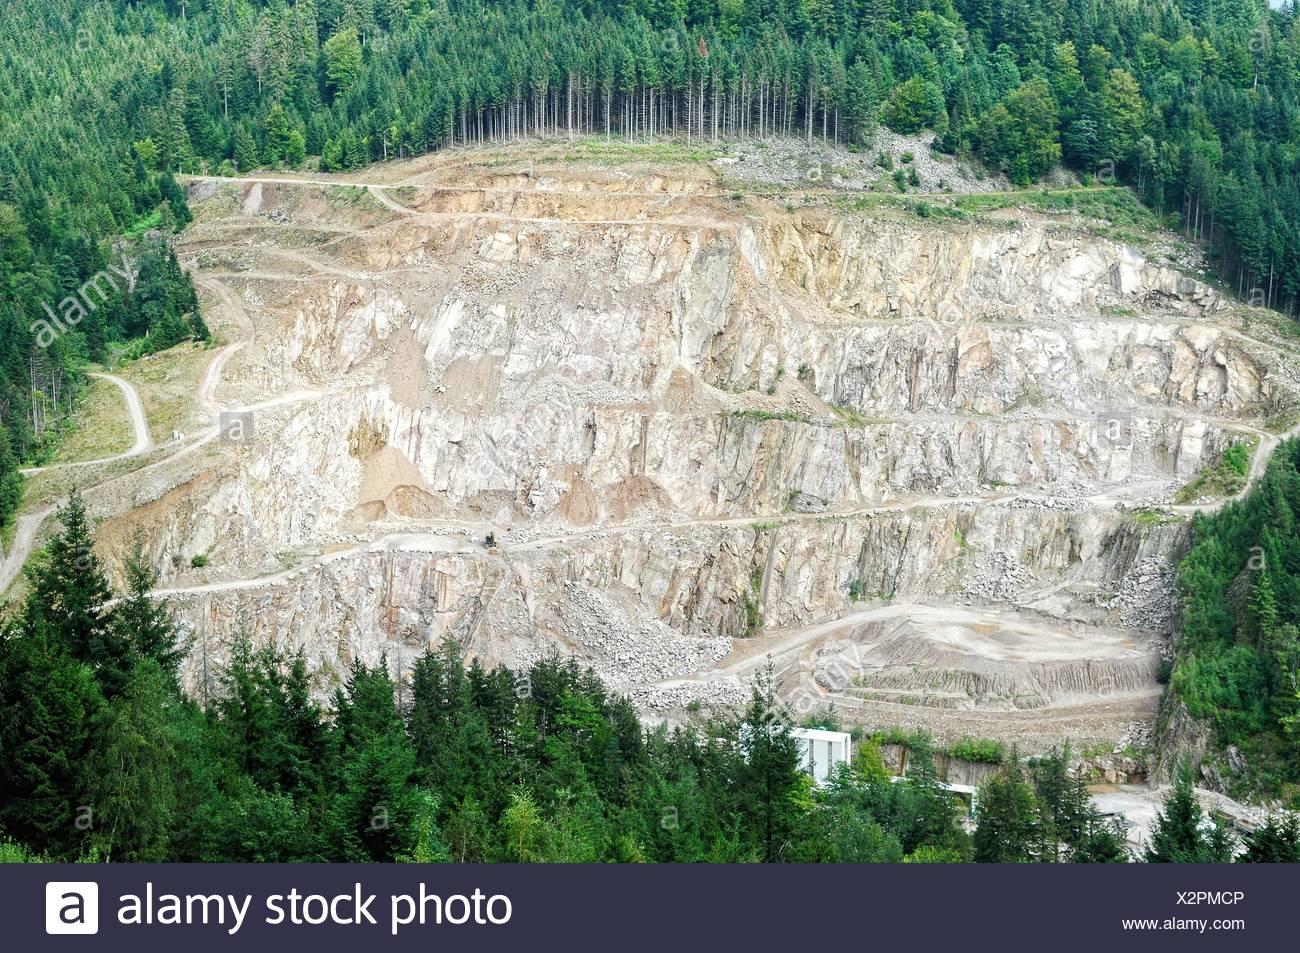 quarry - Stock Image